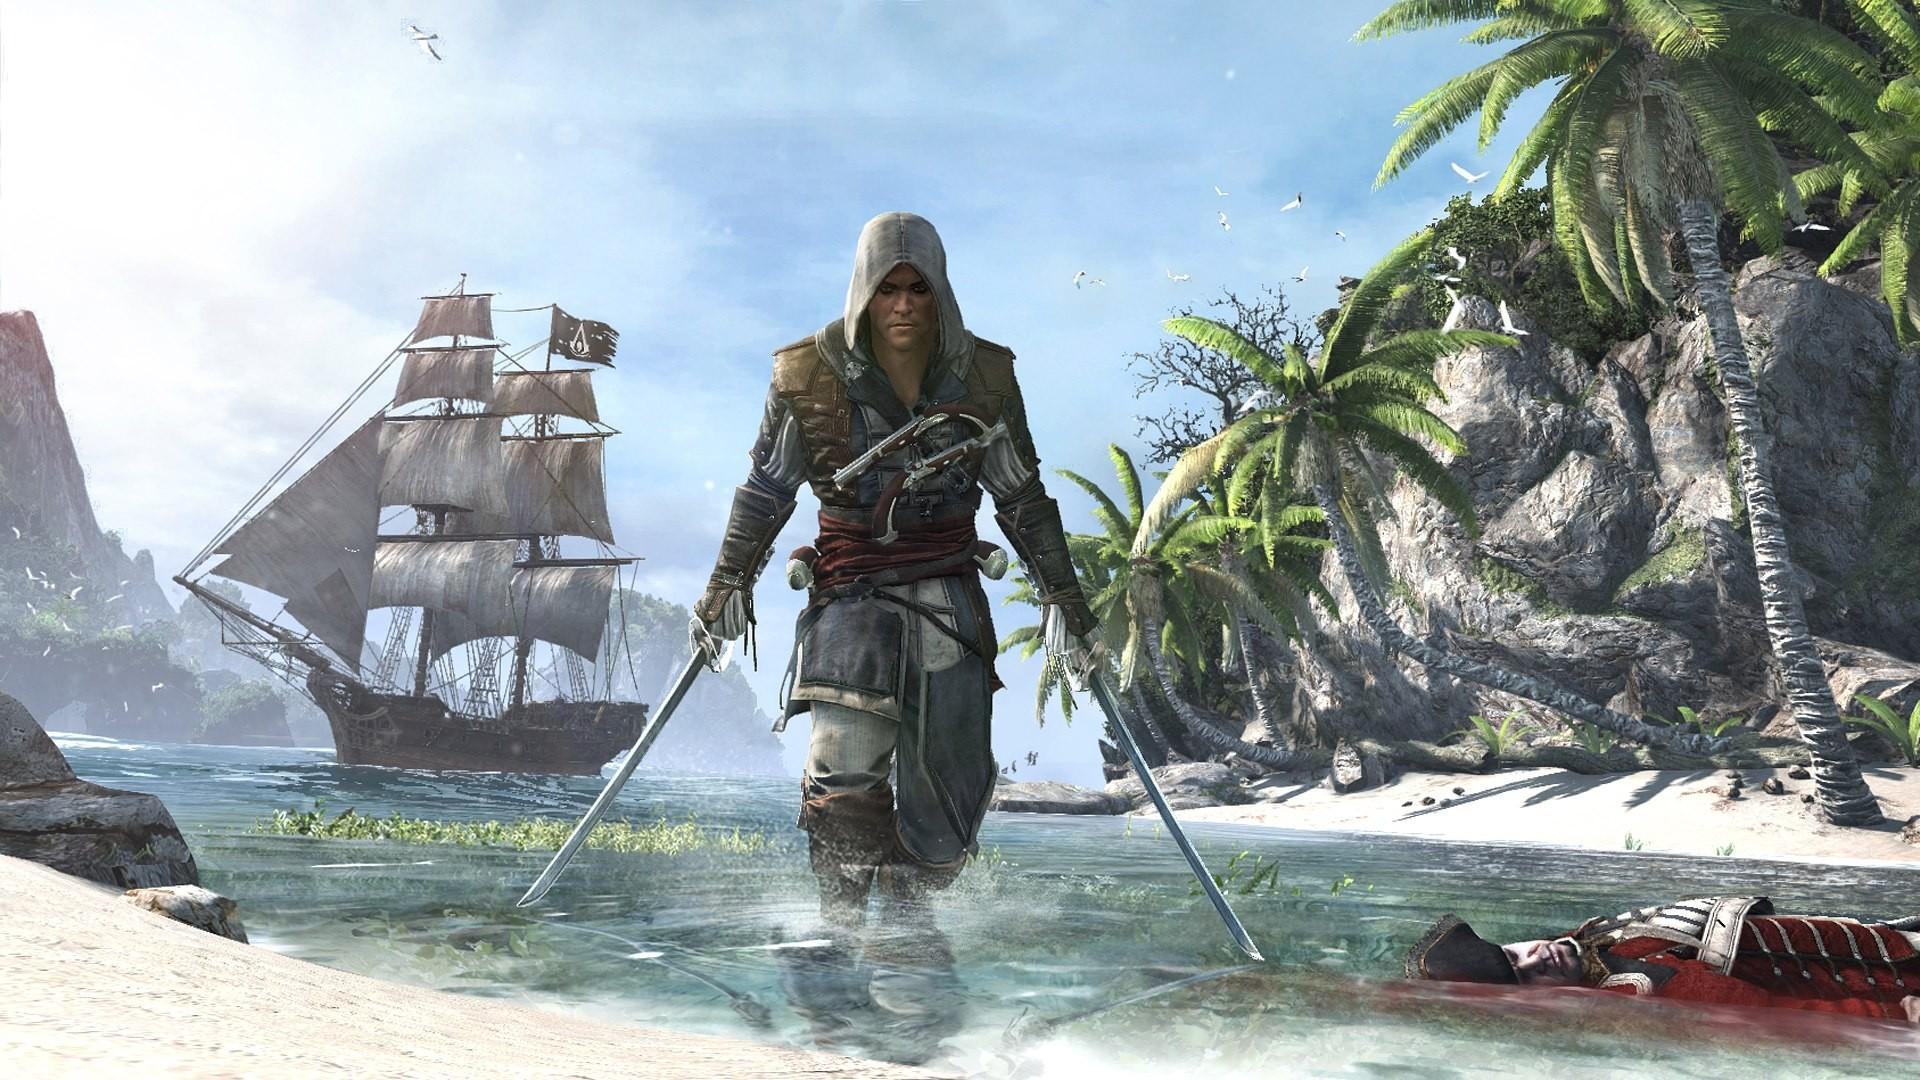 Video Game – Assassin's Creed IV: Black Flag Wallpaper